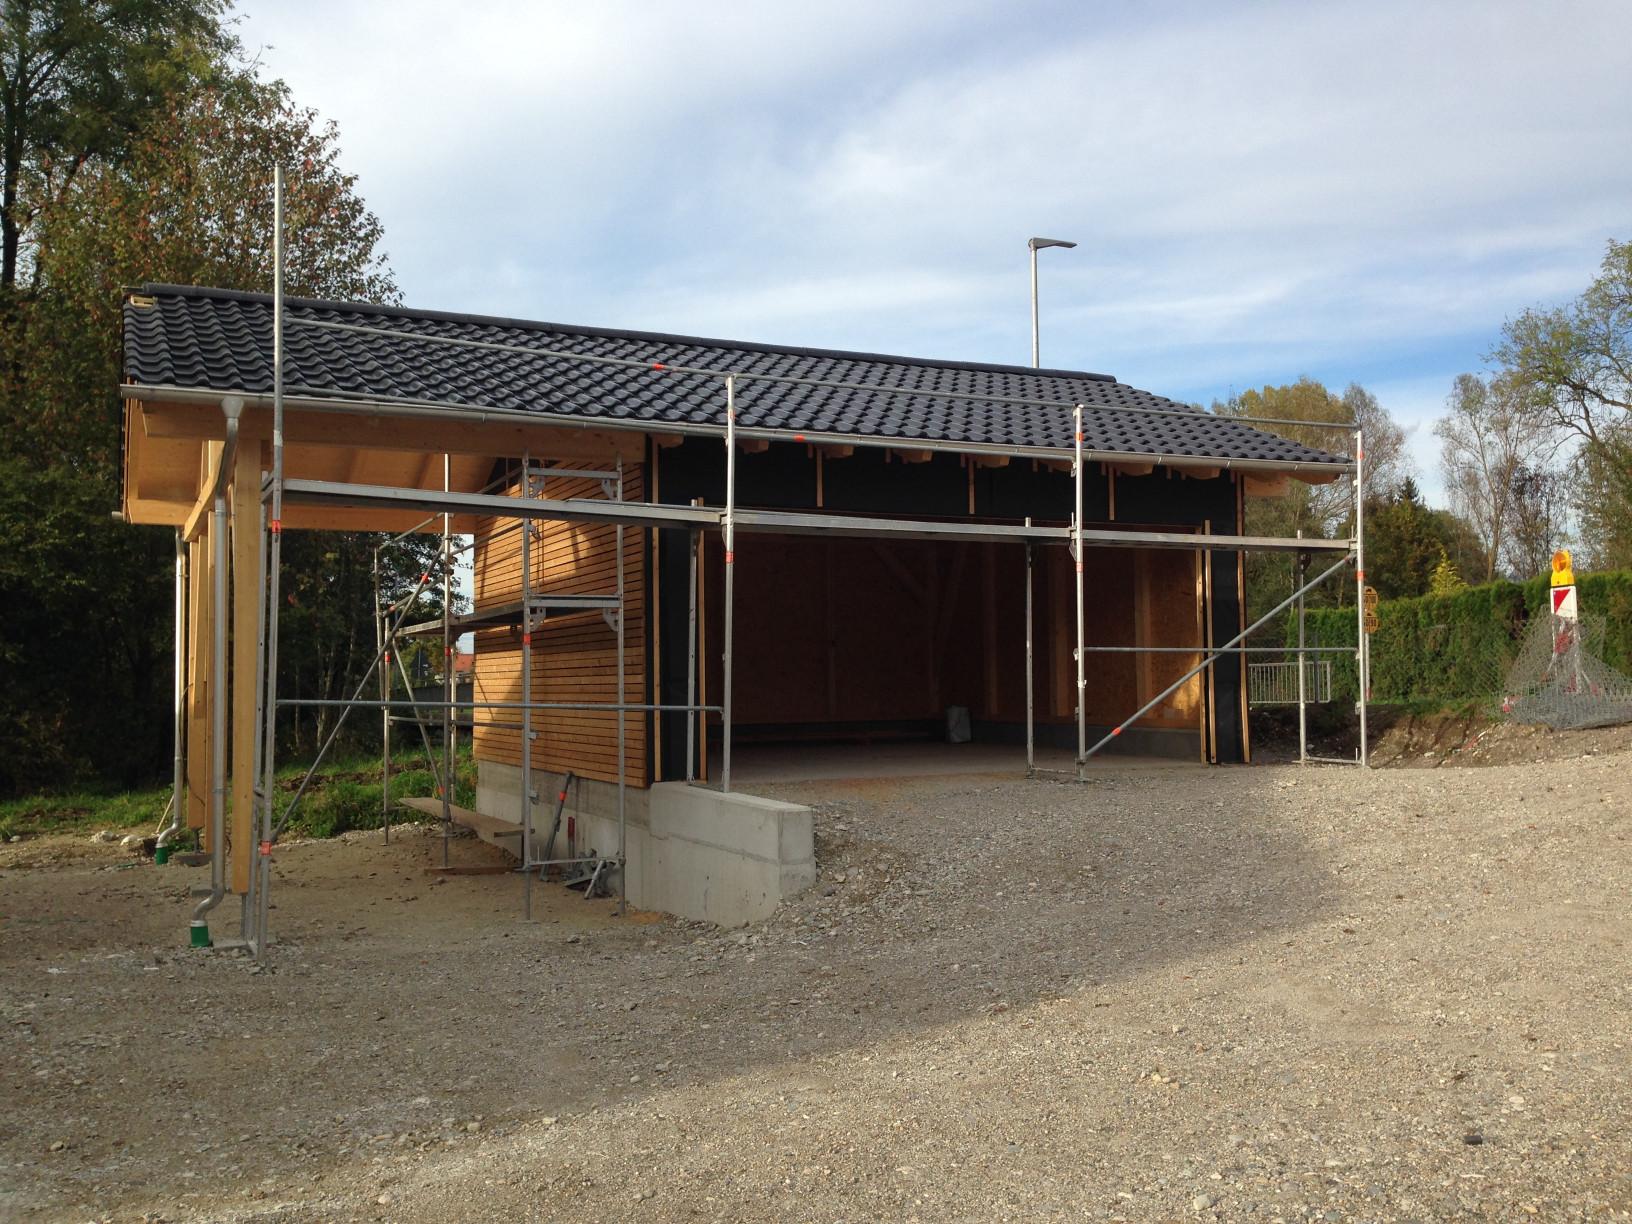 IMG_3523Strasser Holzbau Riedering.jpg